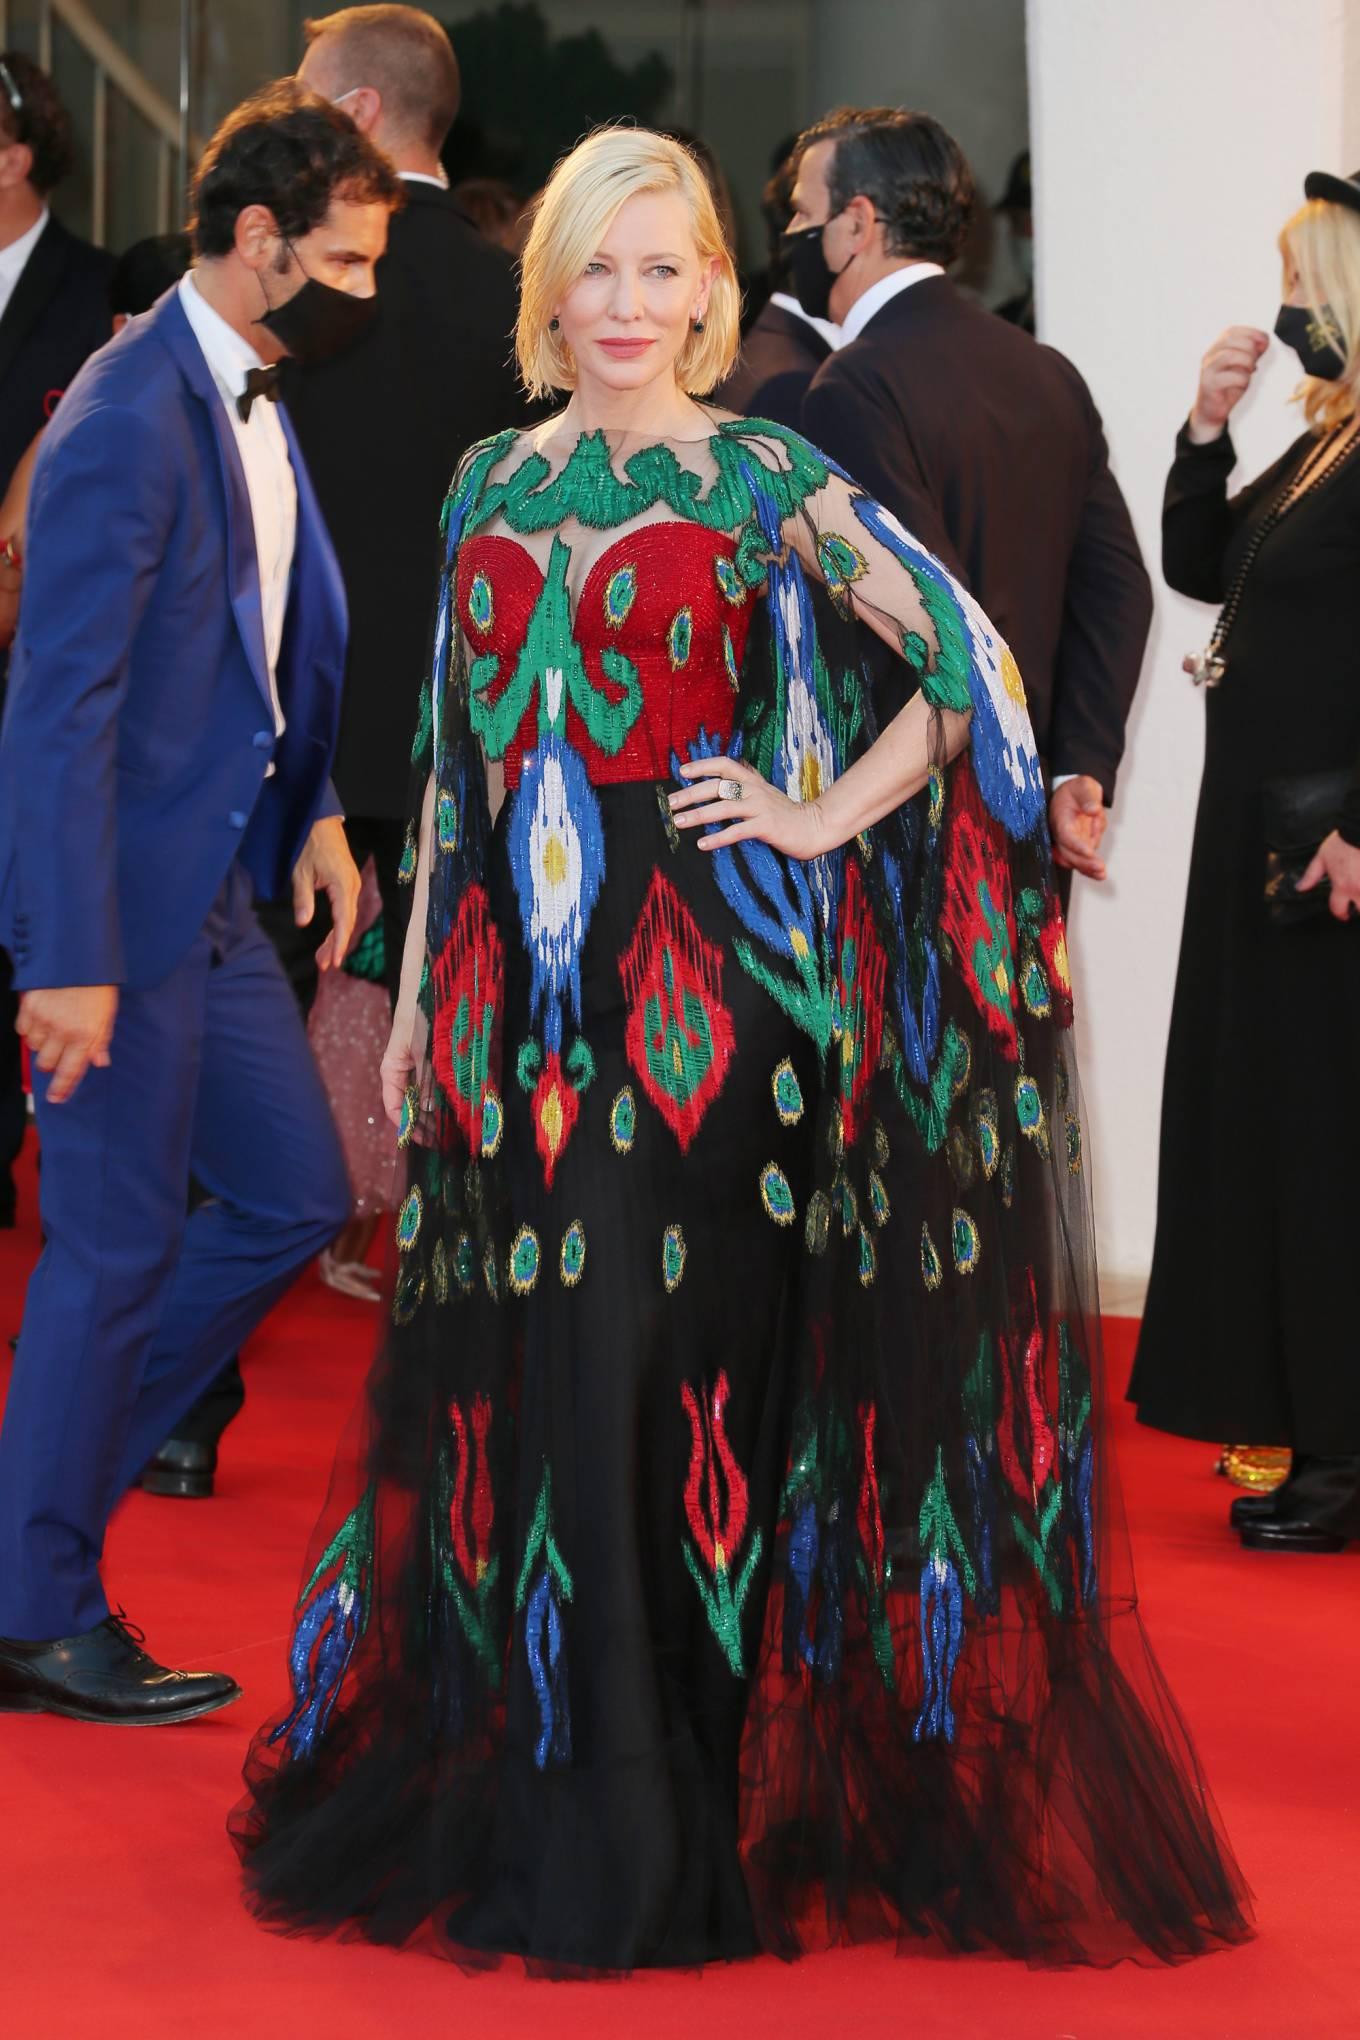 Cate Blanchett 2020 : Cate Blanchett – Closing Ceremony Red Carpet of 2020 Venice Film Festival in Venice-14